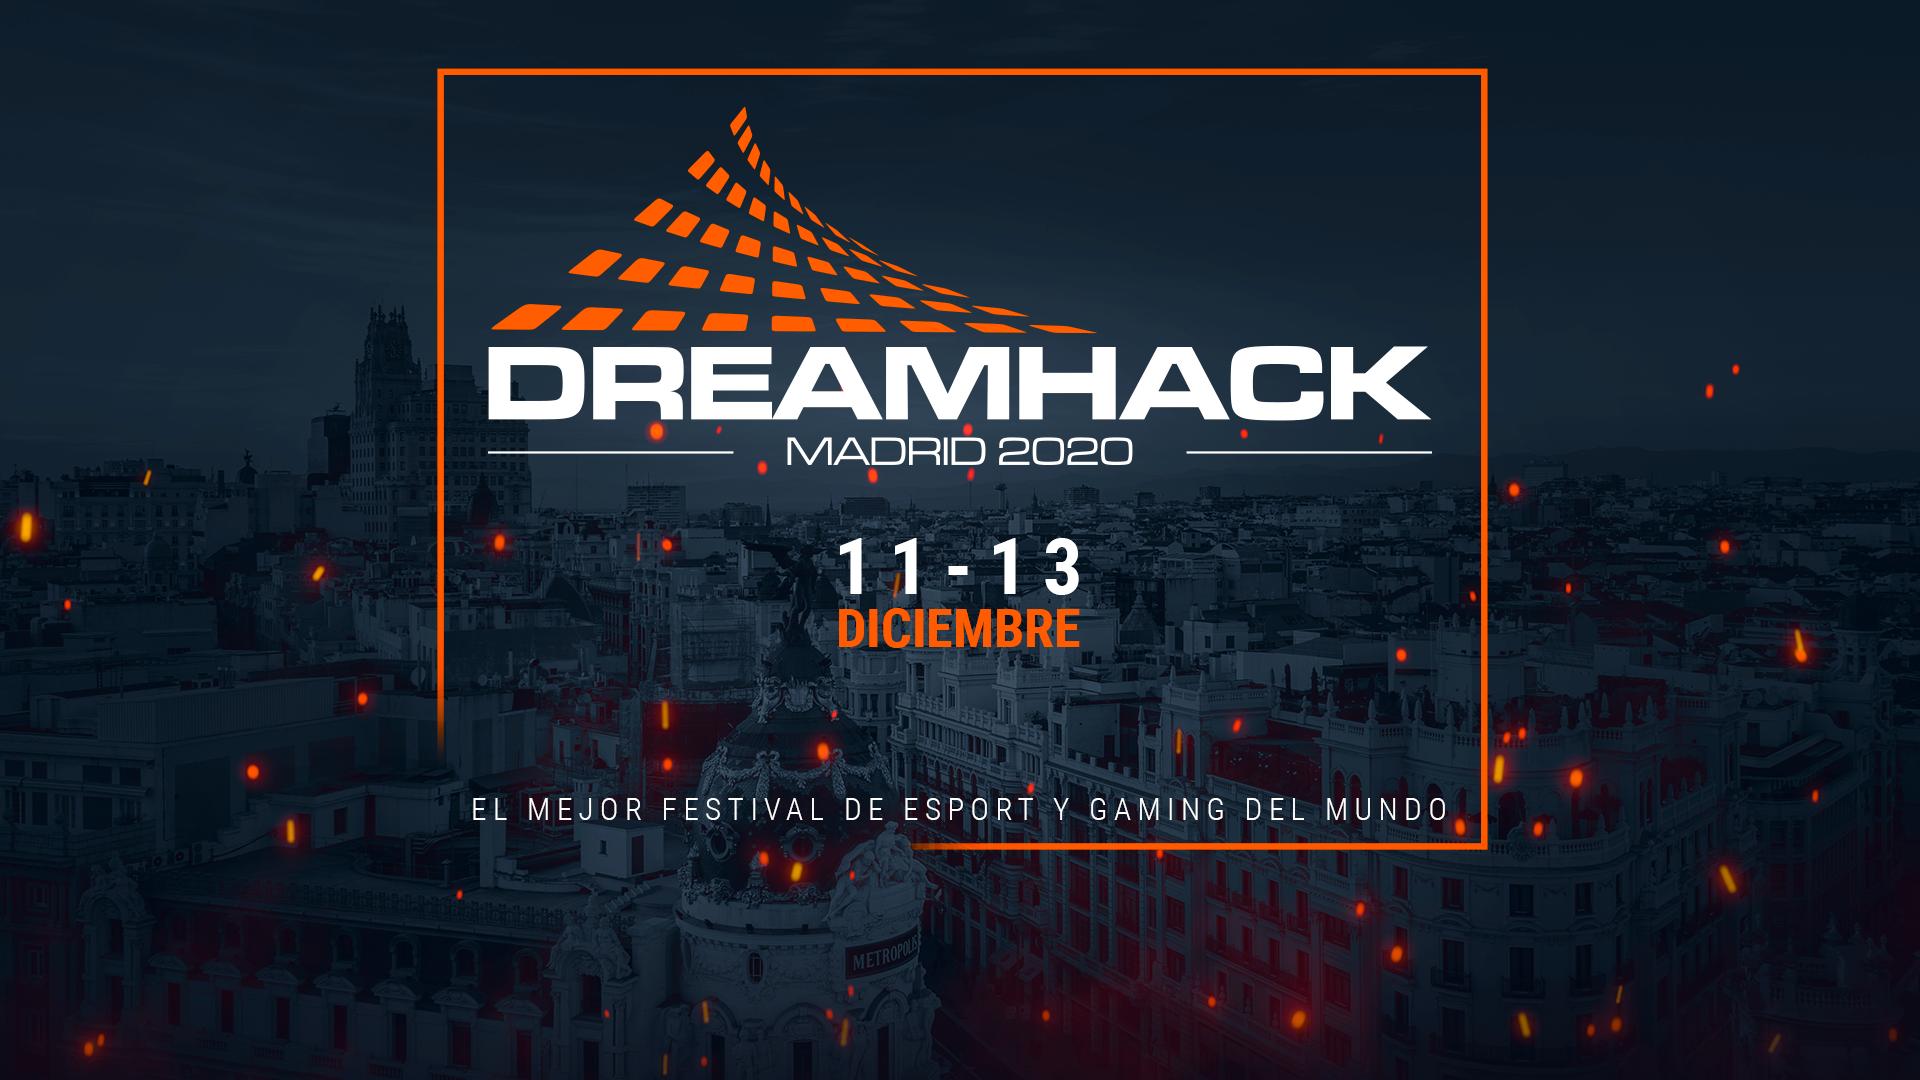 DreamHack Madrid